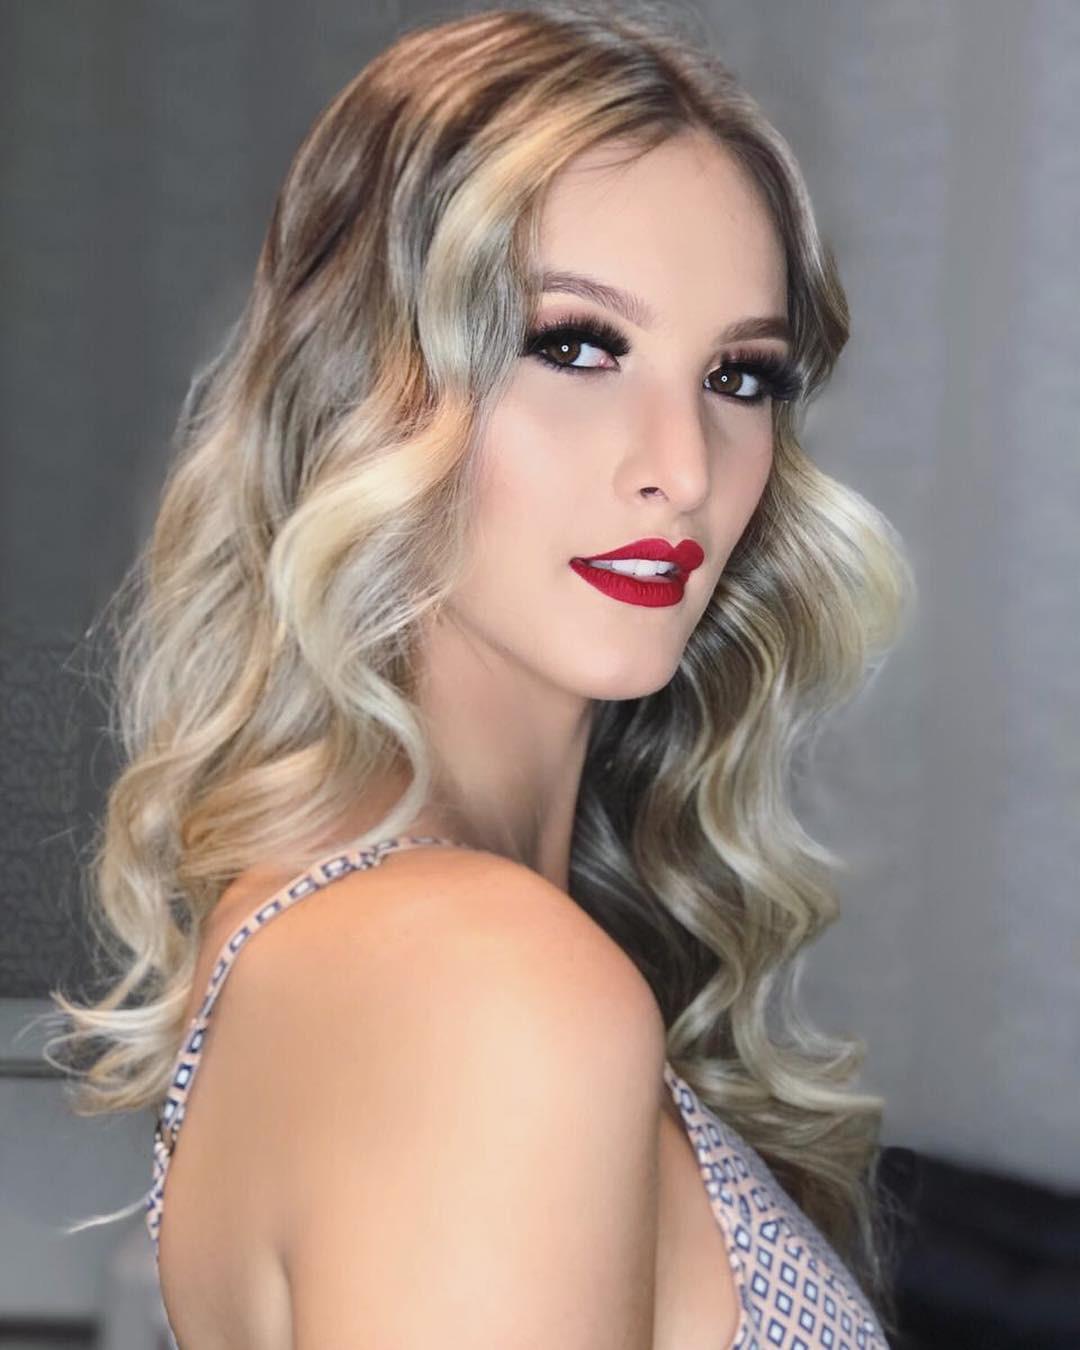 larissa neiverth, top 20 de miss brasil mundo 2019. - Página 3 Qgg9iq10